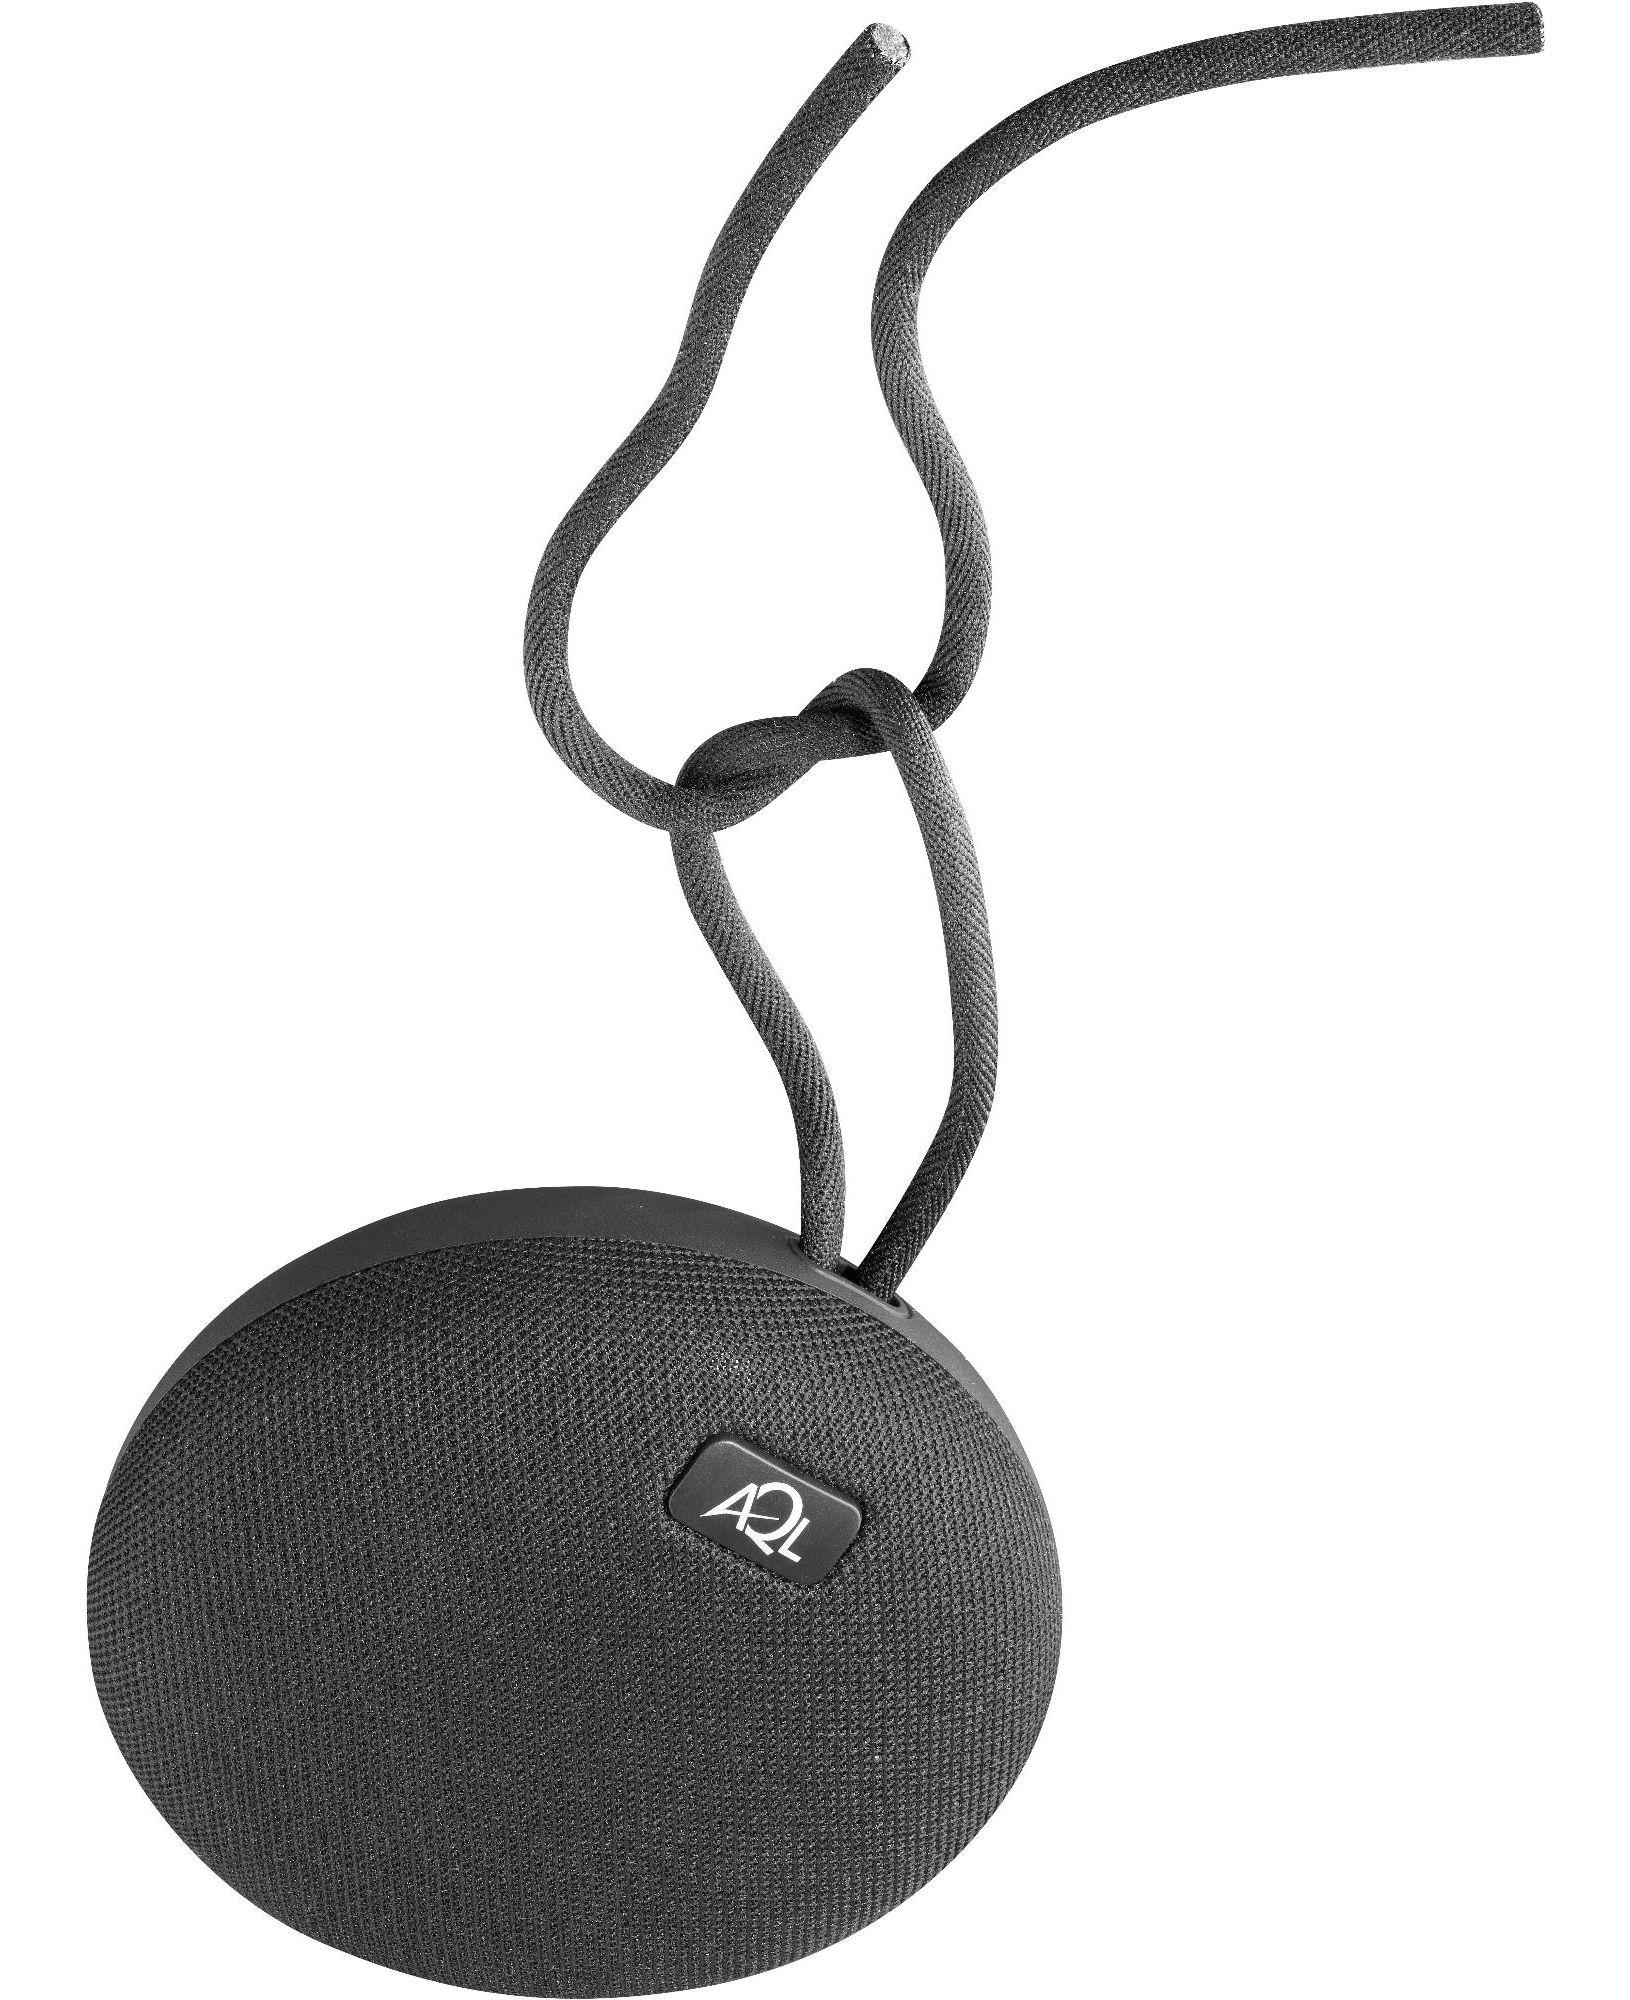 AQL Plump - Universale Speaker Bluetooth® portatile resistente all'acqua Nero